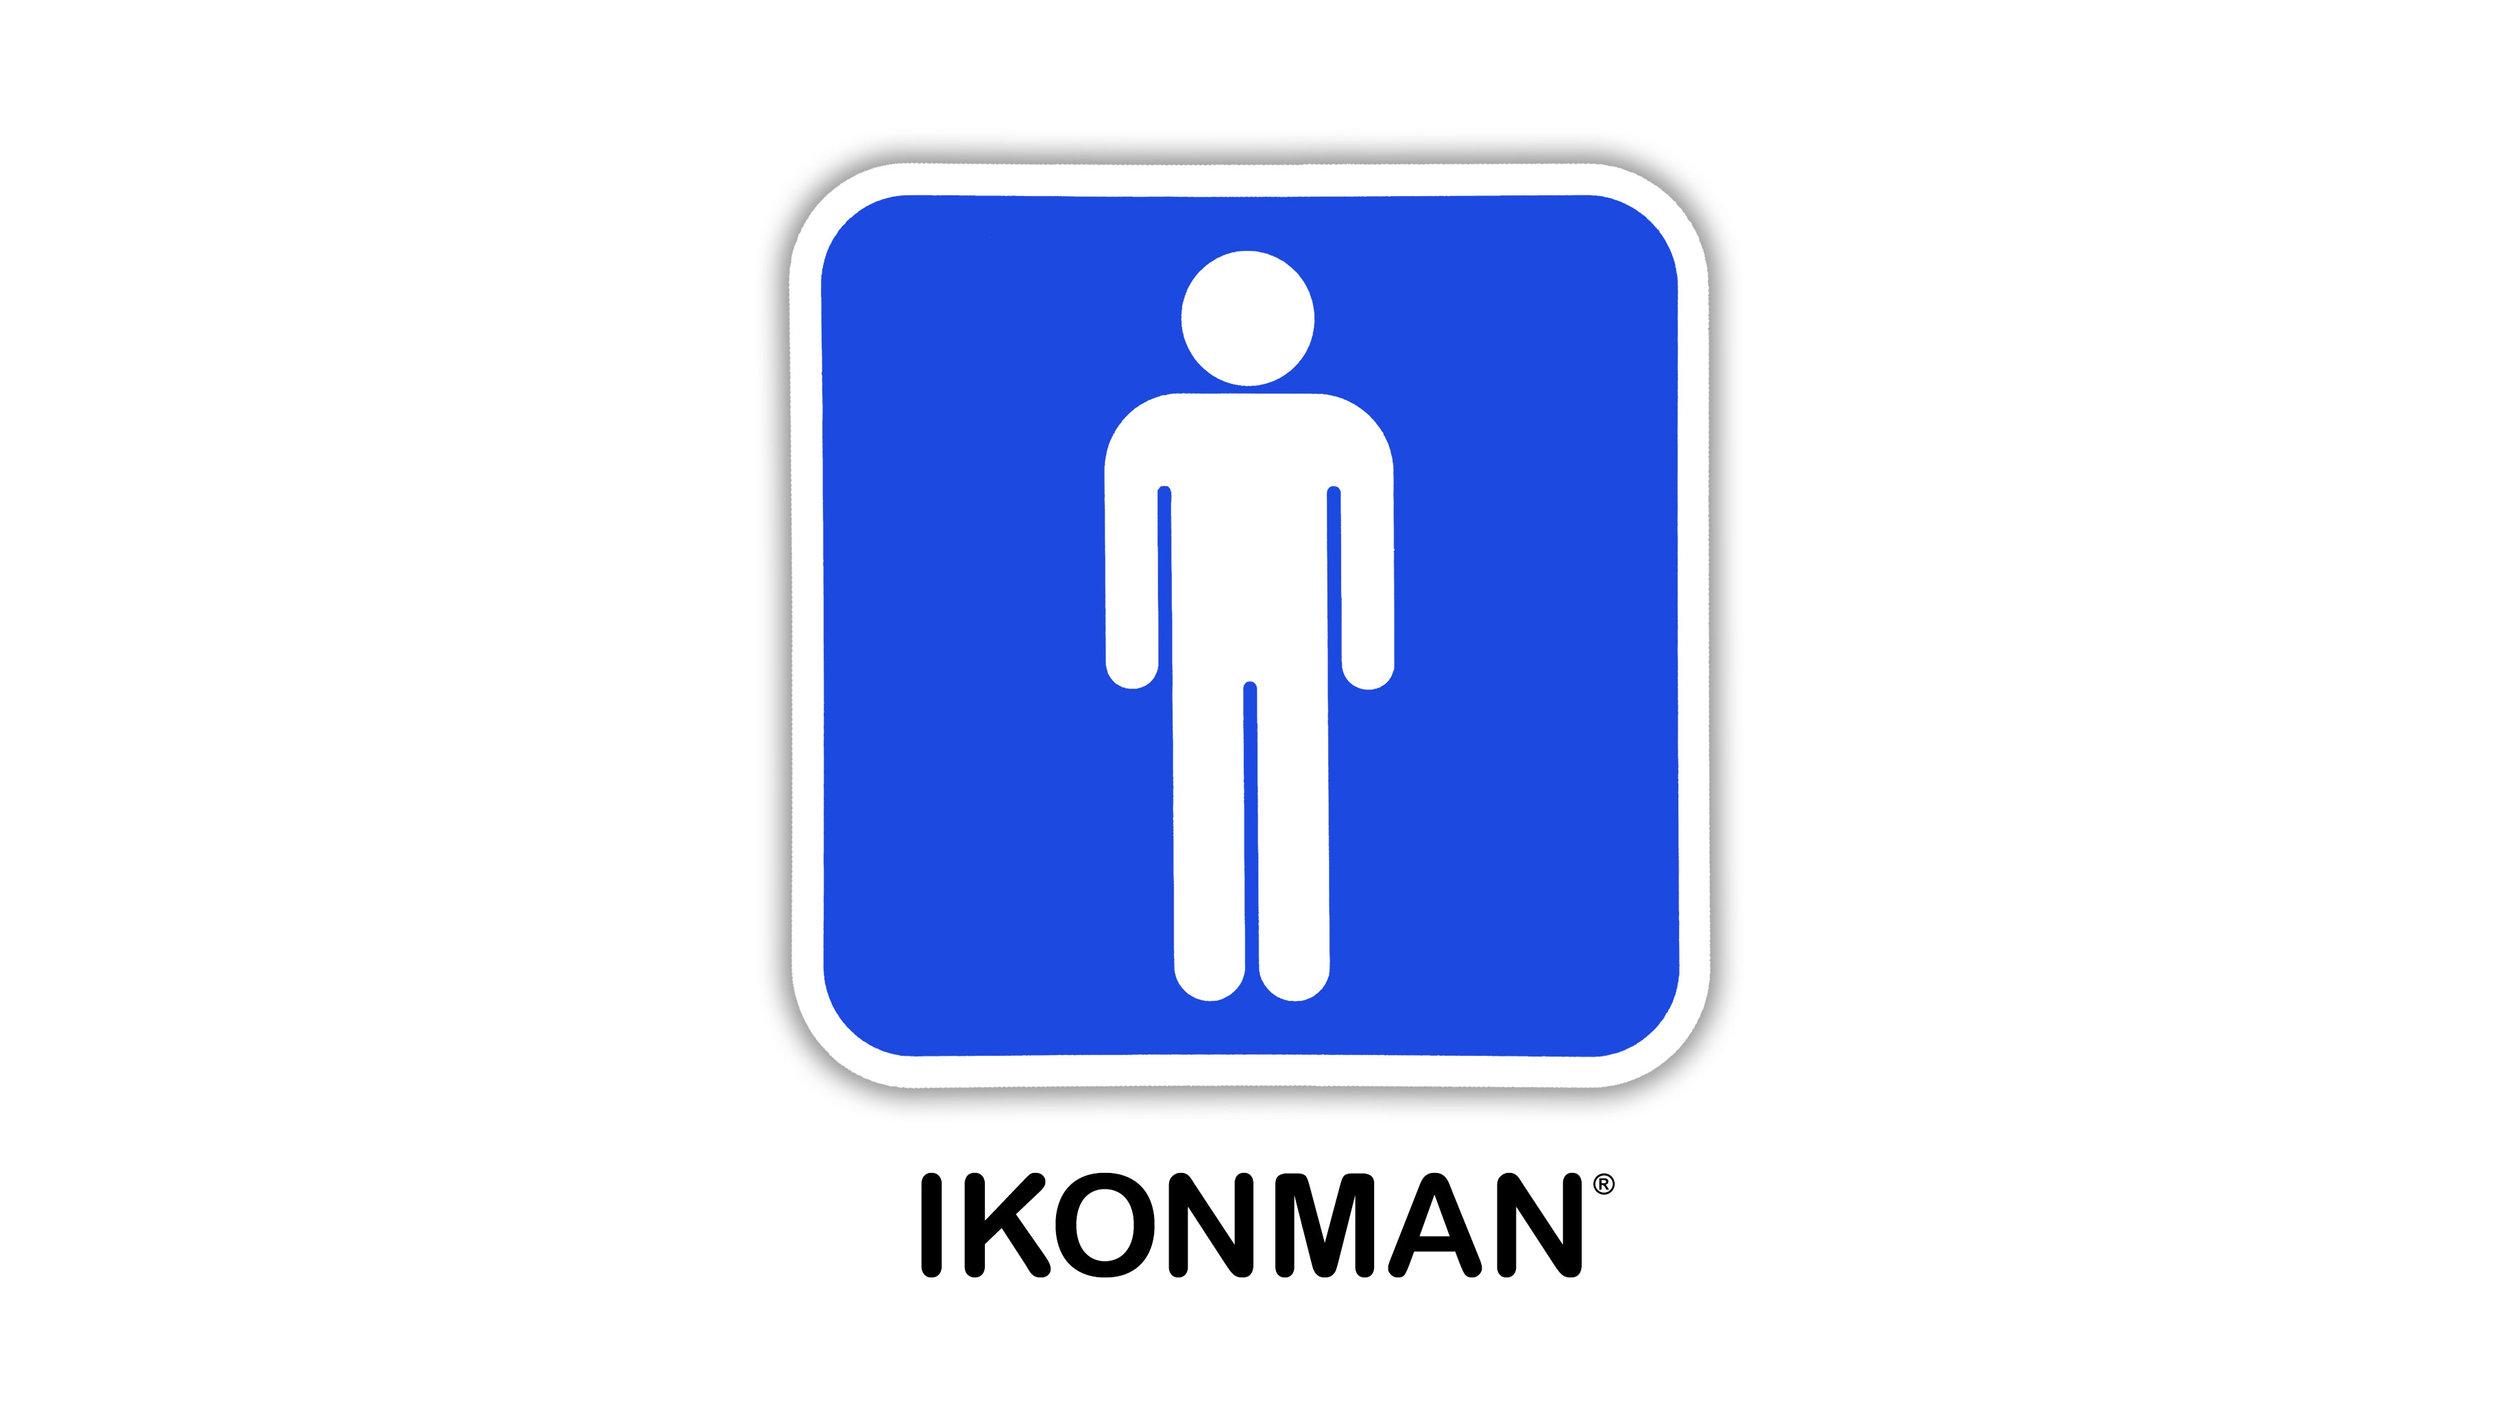 IKONMAN_TOTL-v3a-wide.jpg